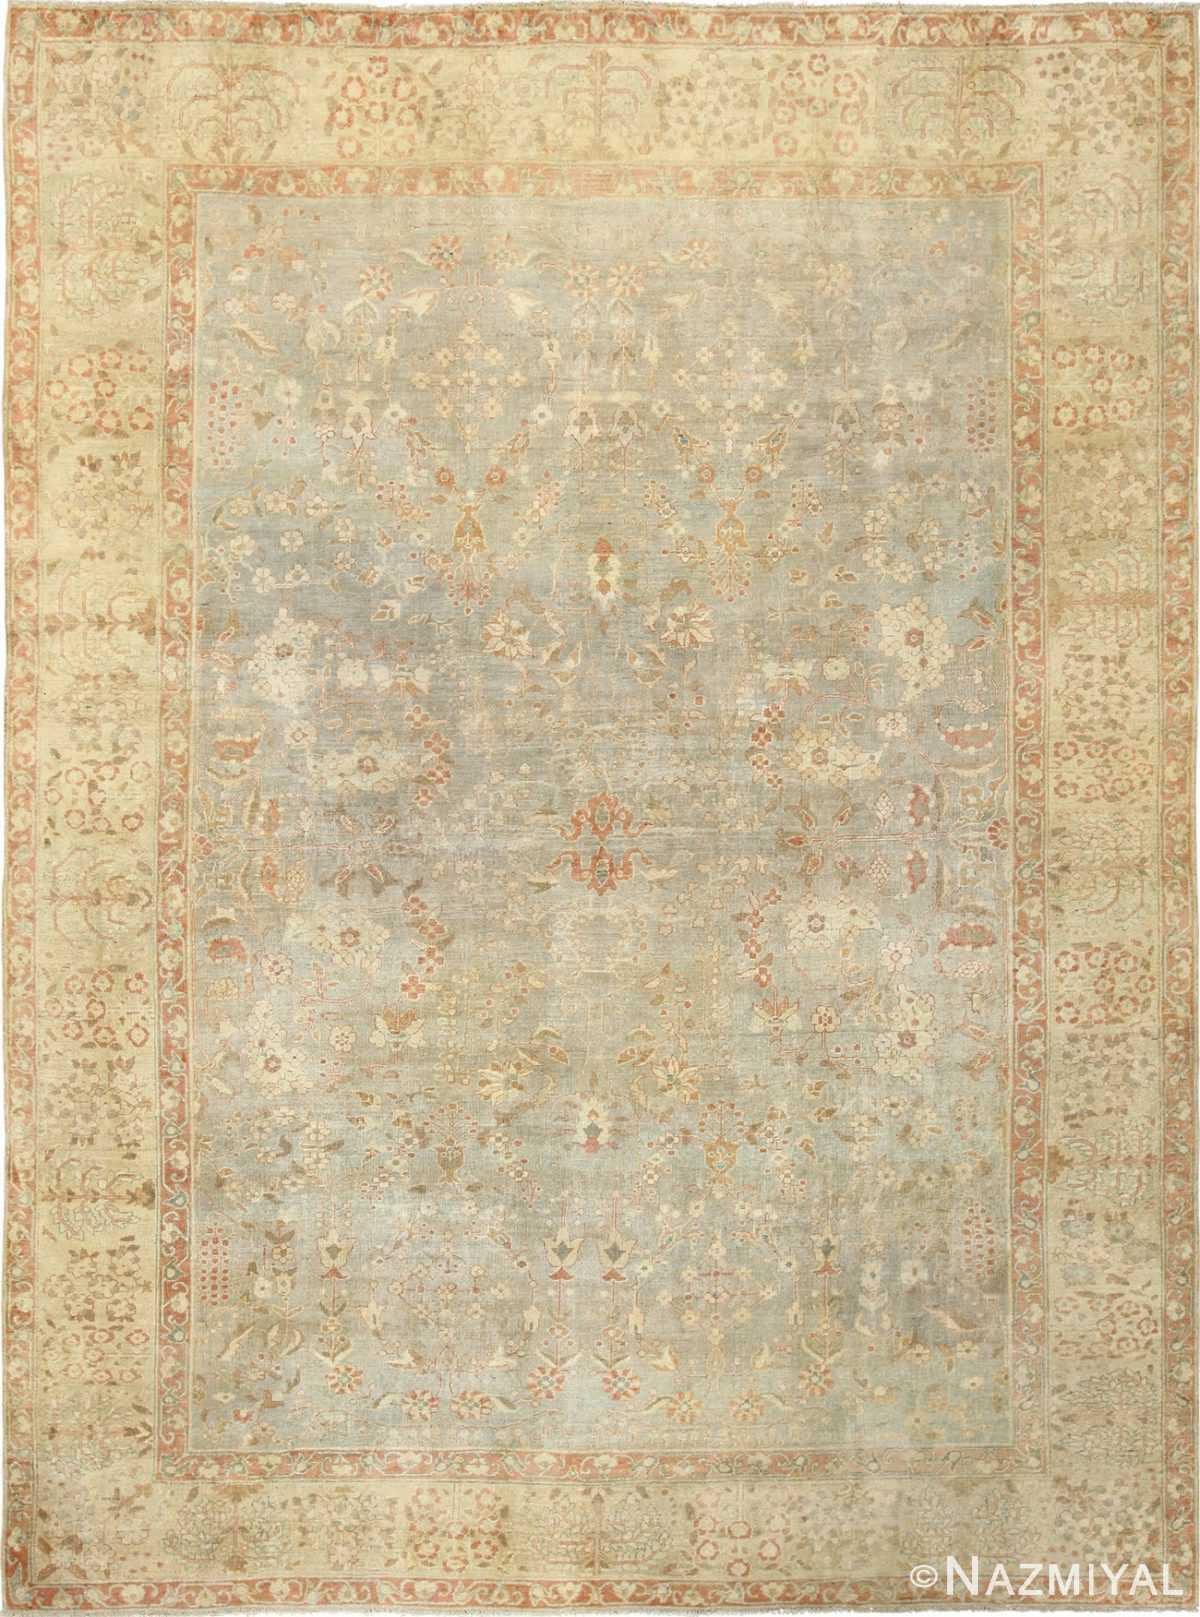 gray background antique agra indian rug 49084 Nazmiyal